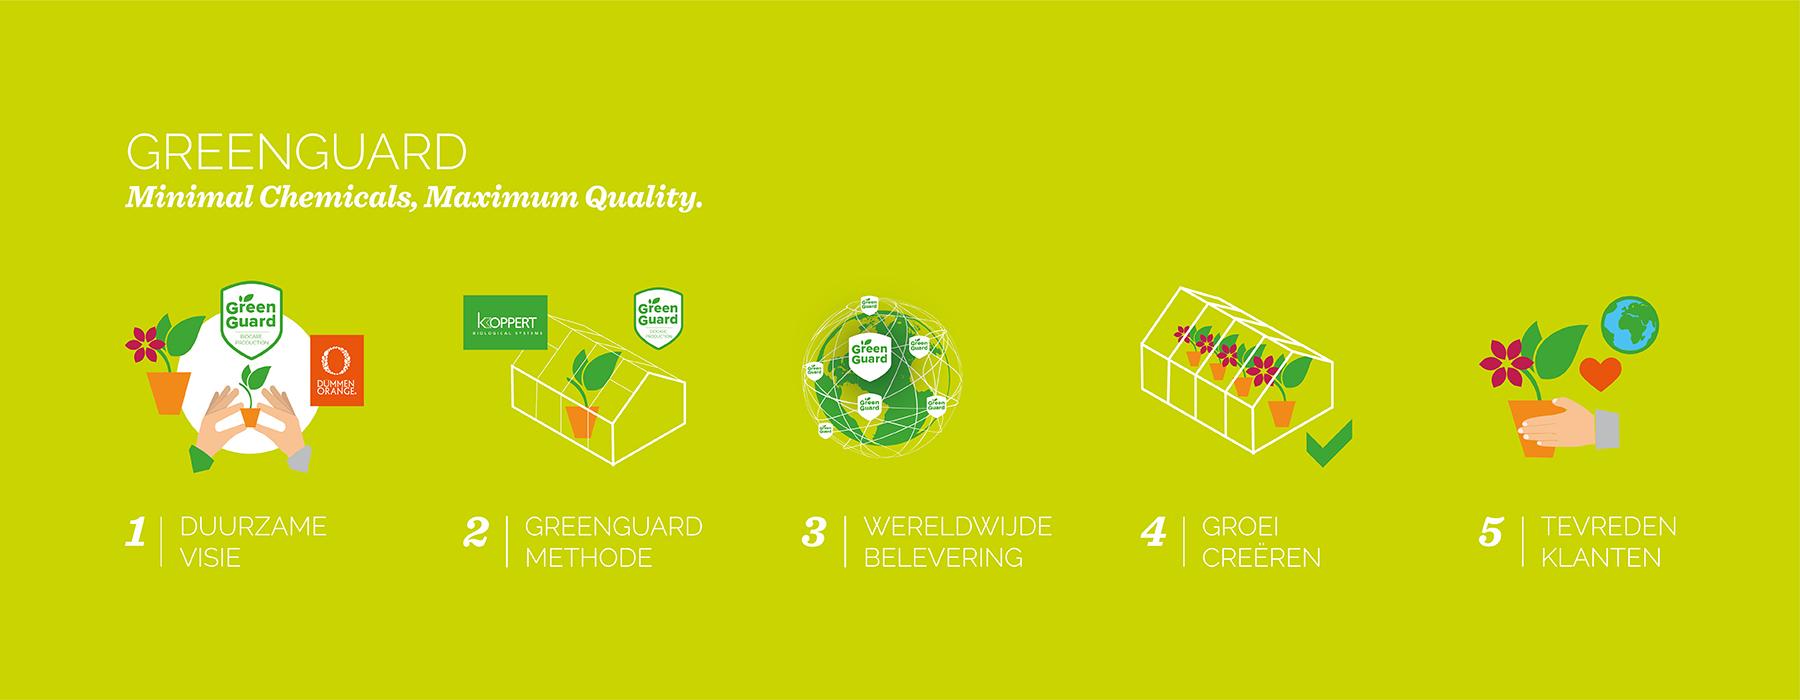 GreenGuard infographic